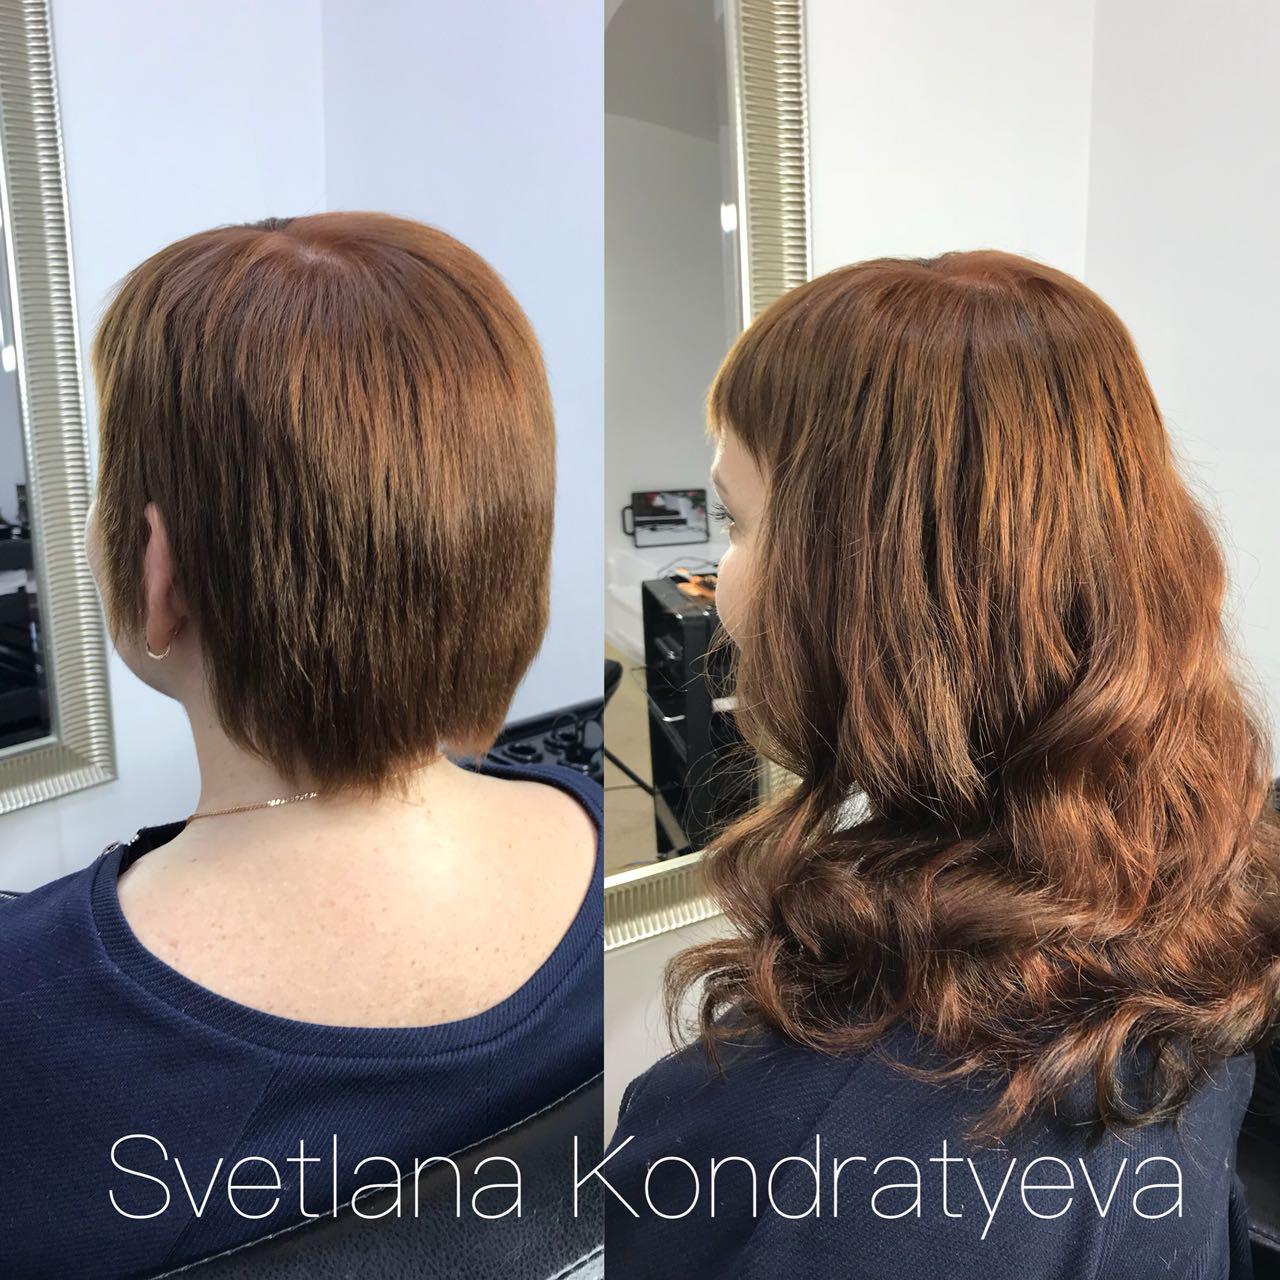 наращивание на короткие волосы